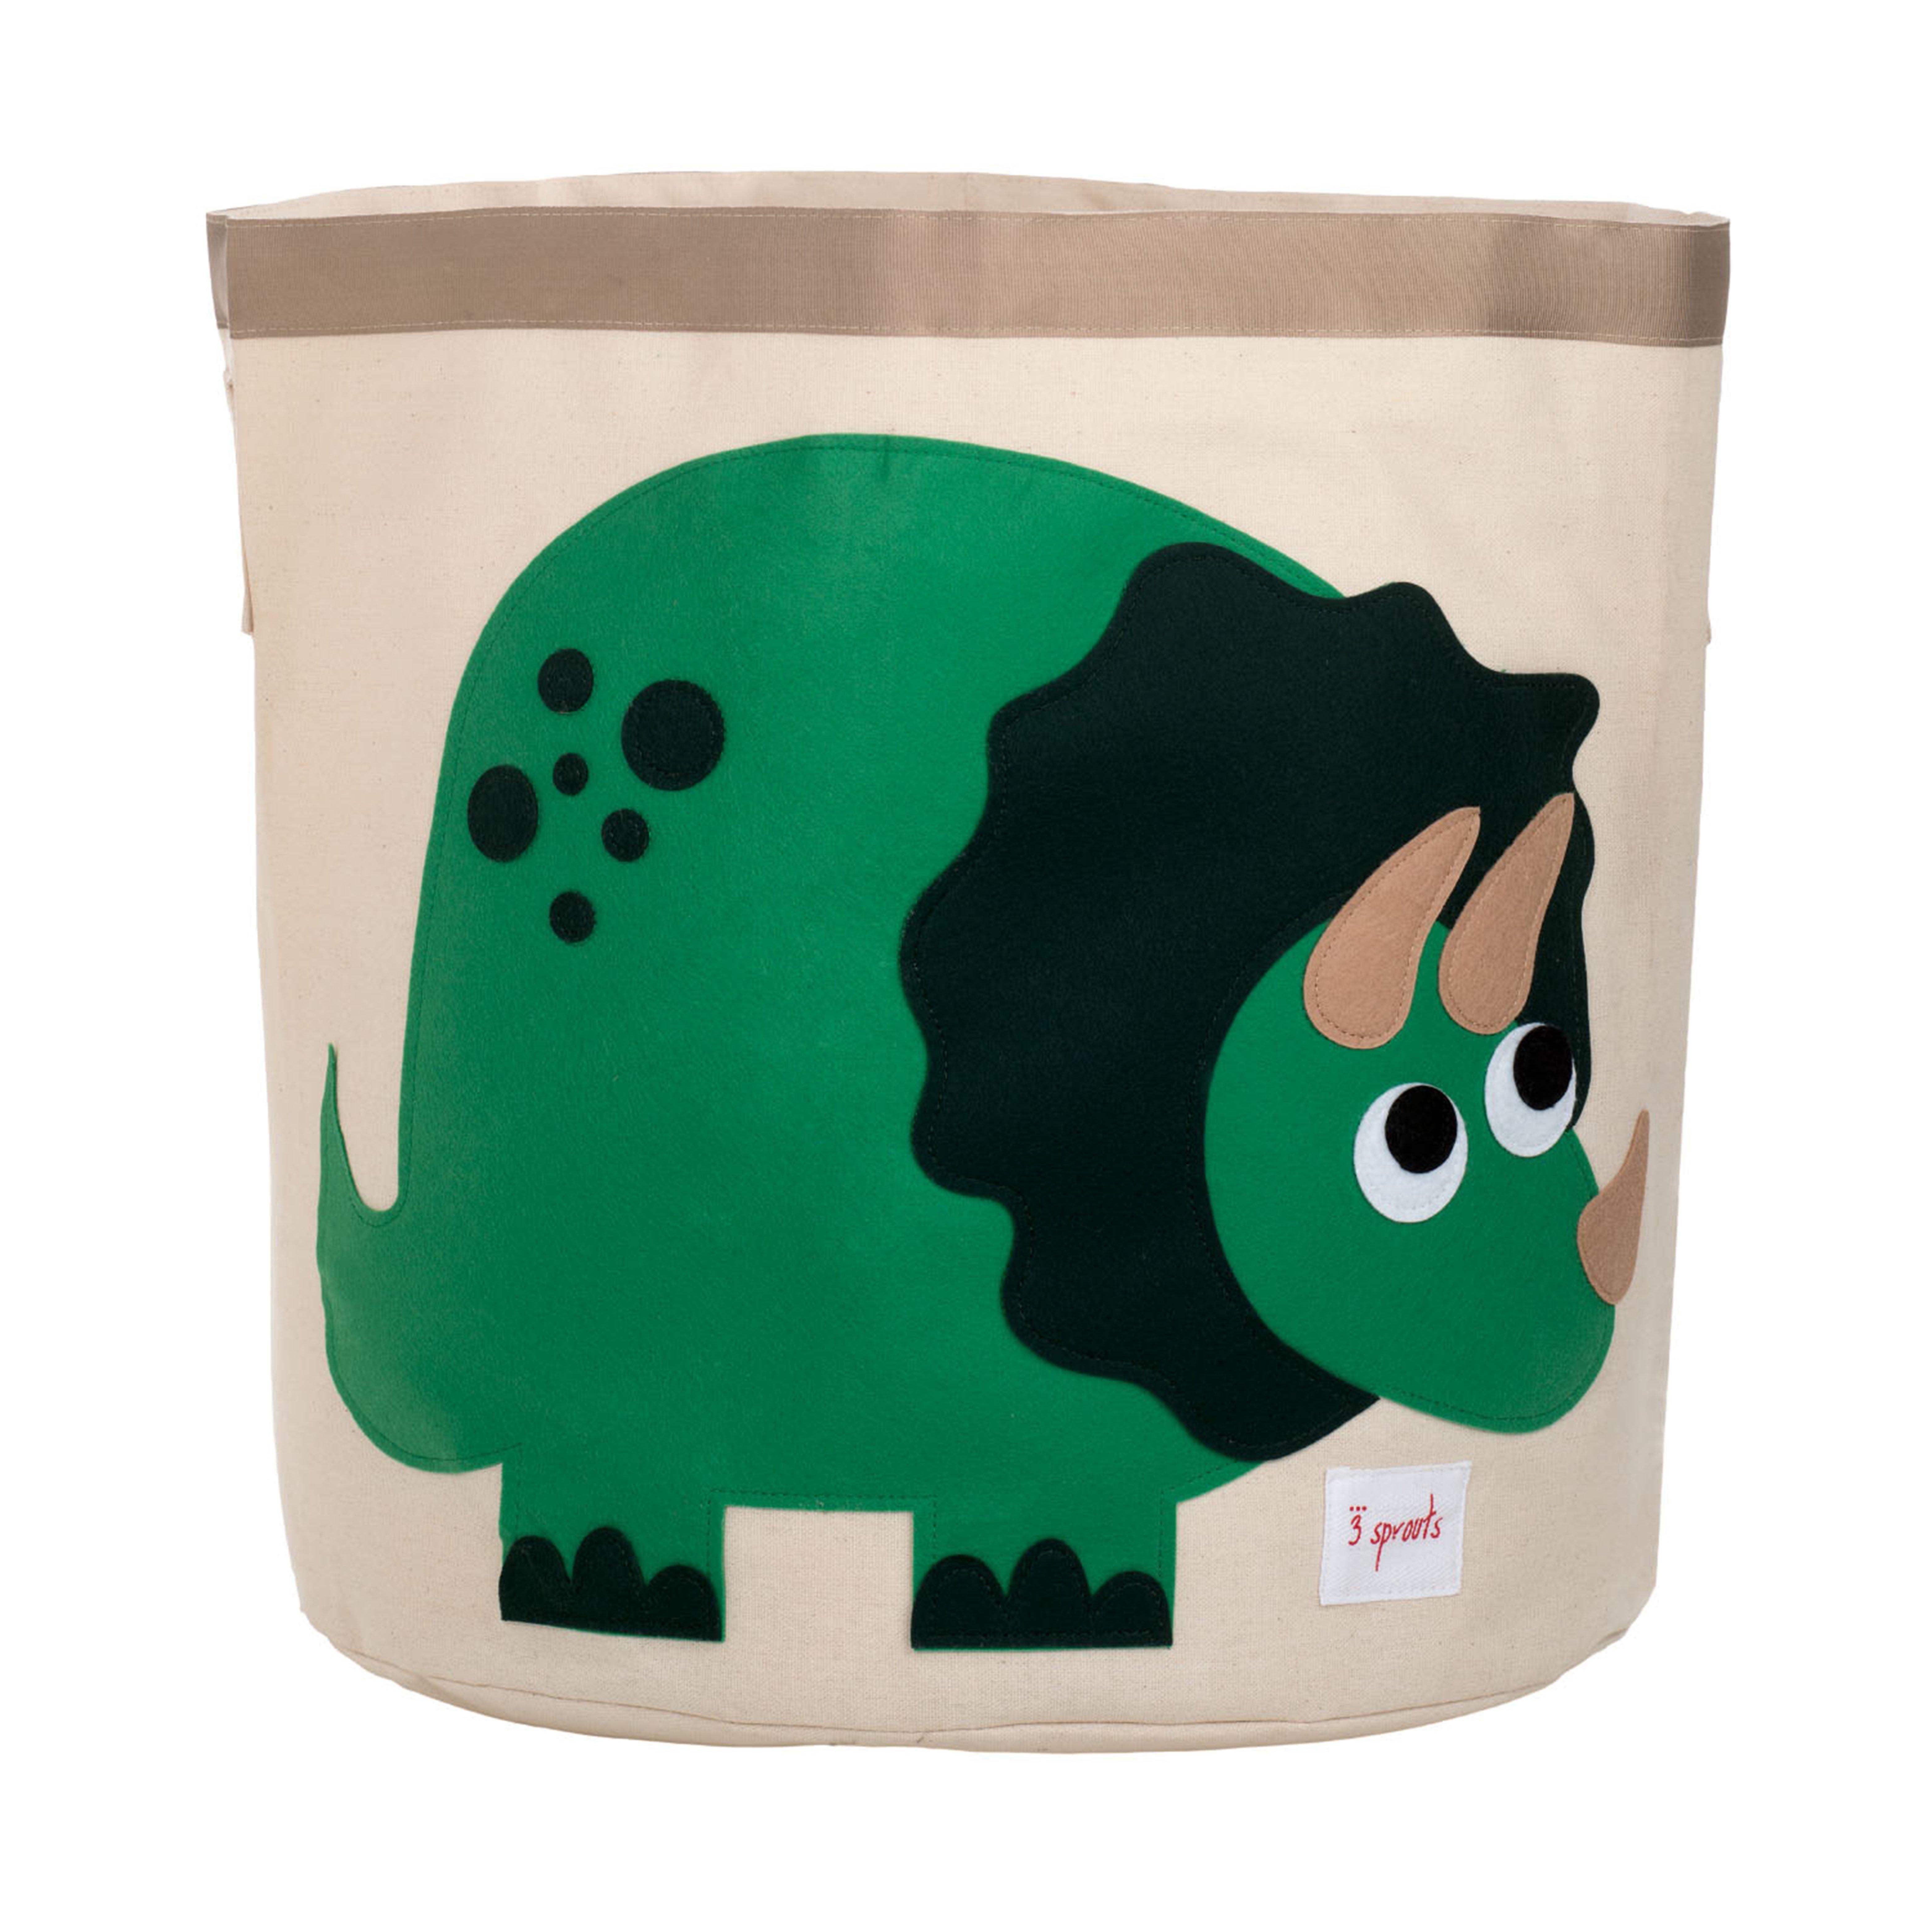 3 Sprouts - Storage Bin - Green Dino